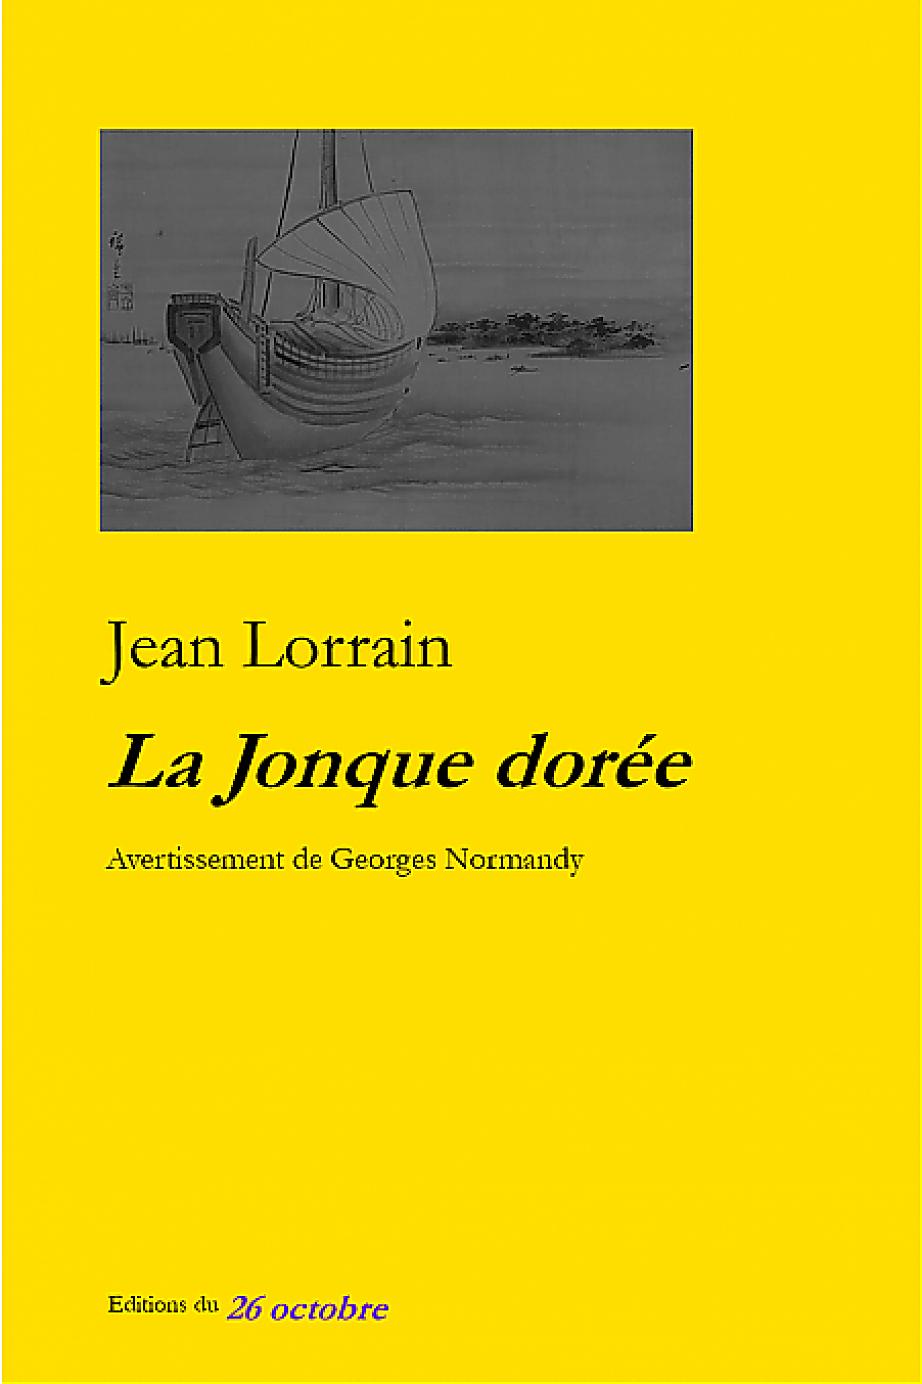 «La Jonque dorée» de Jean Lorrain.